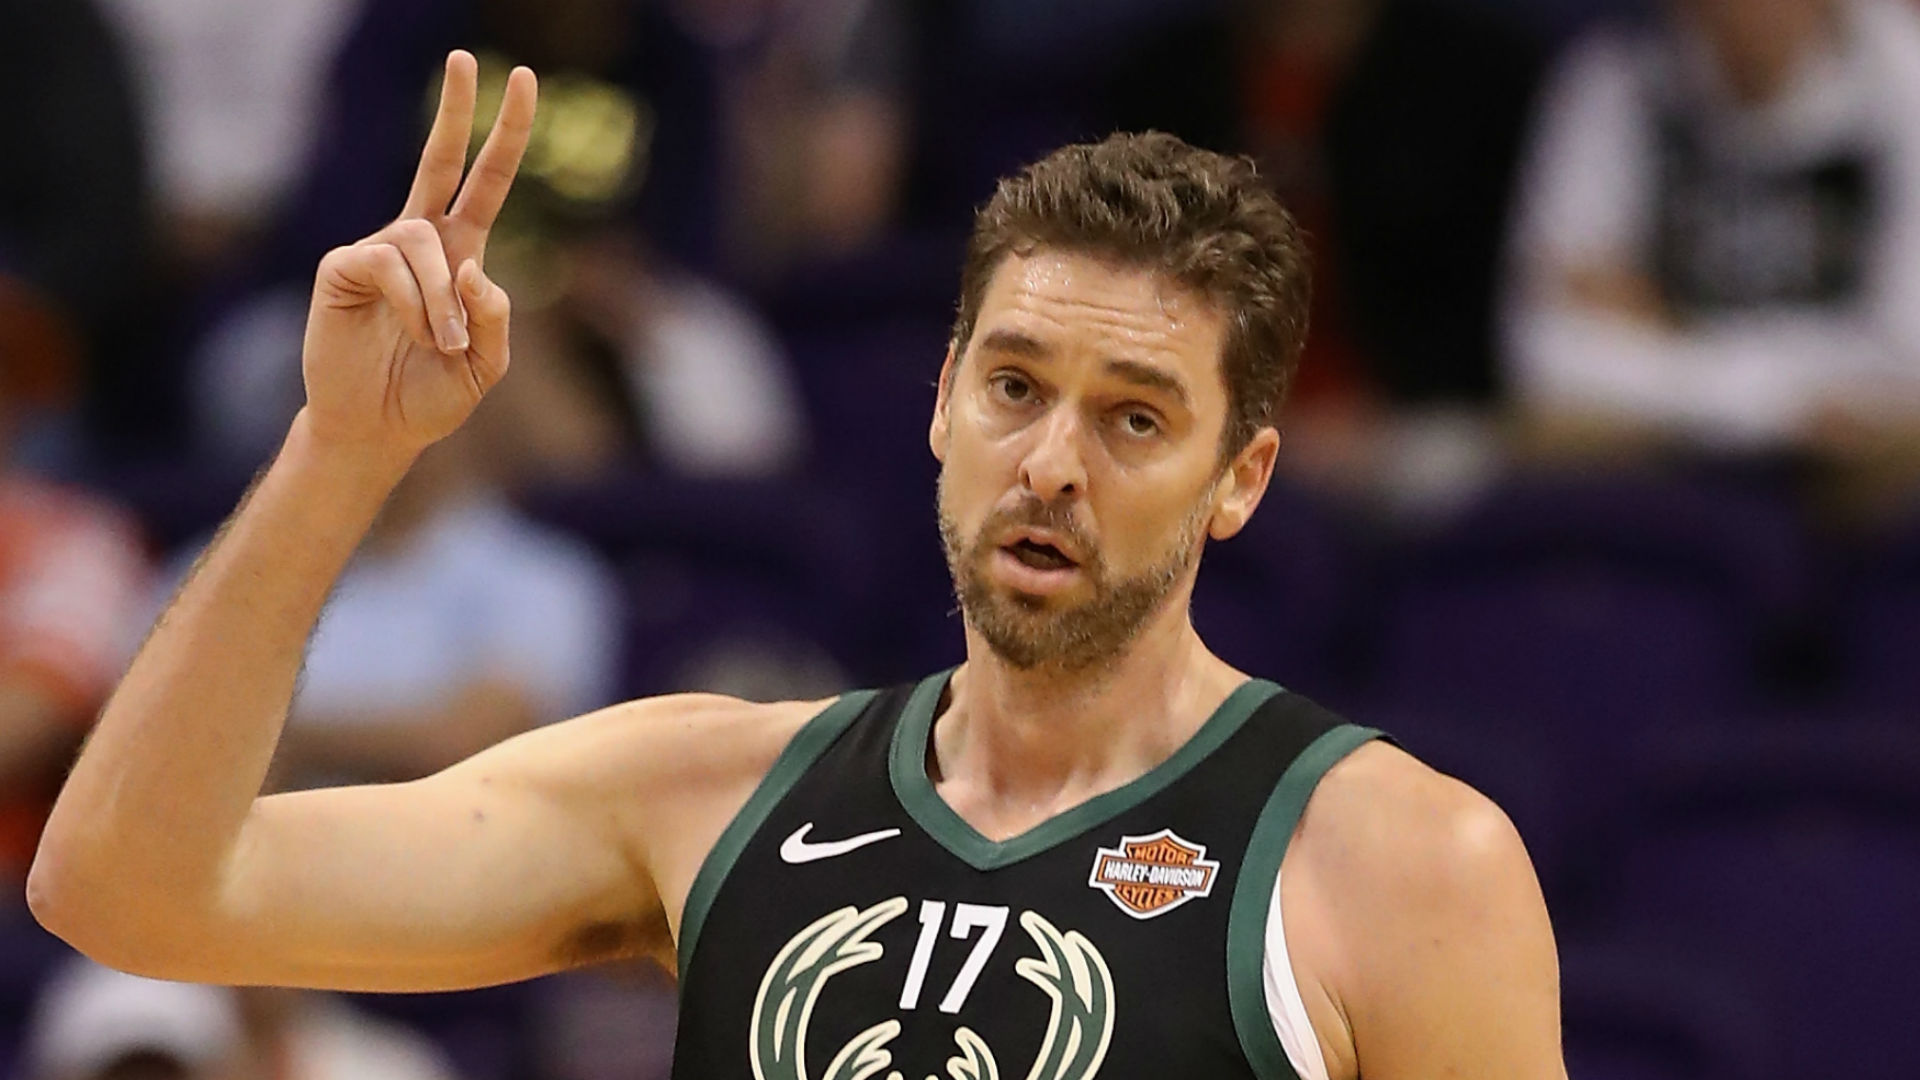 Bucks' Gasol to miss rest of NBA playoffs after foot surgery